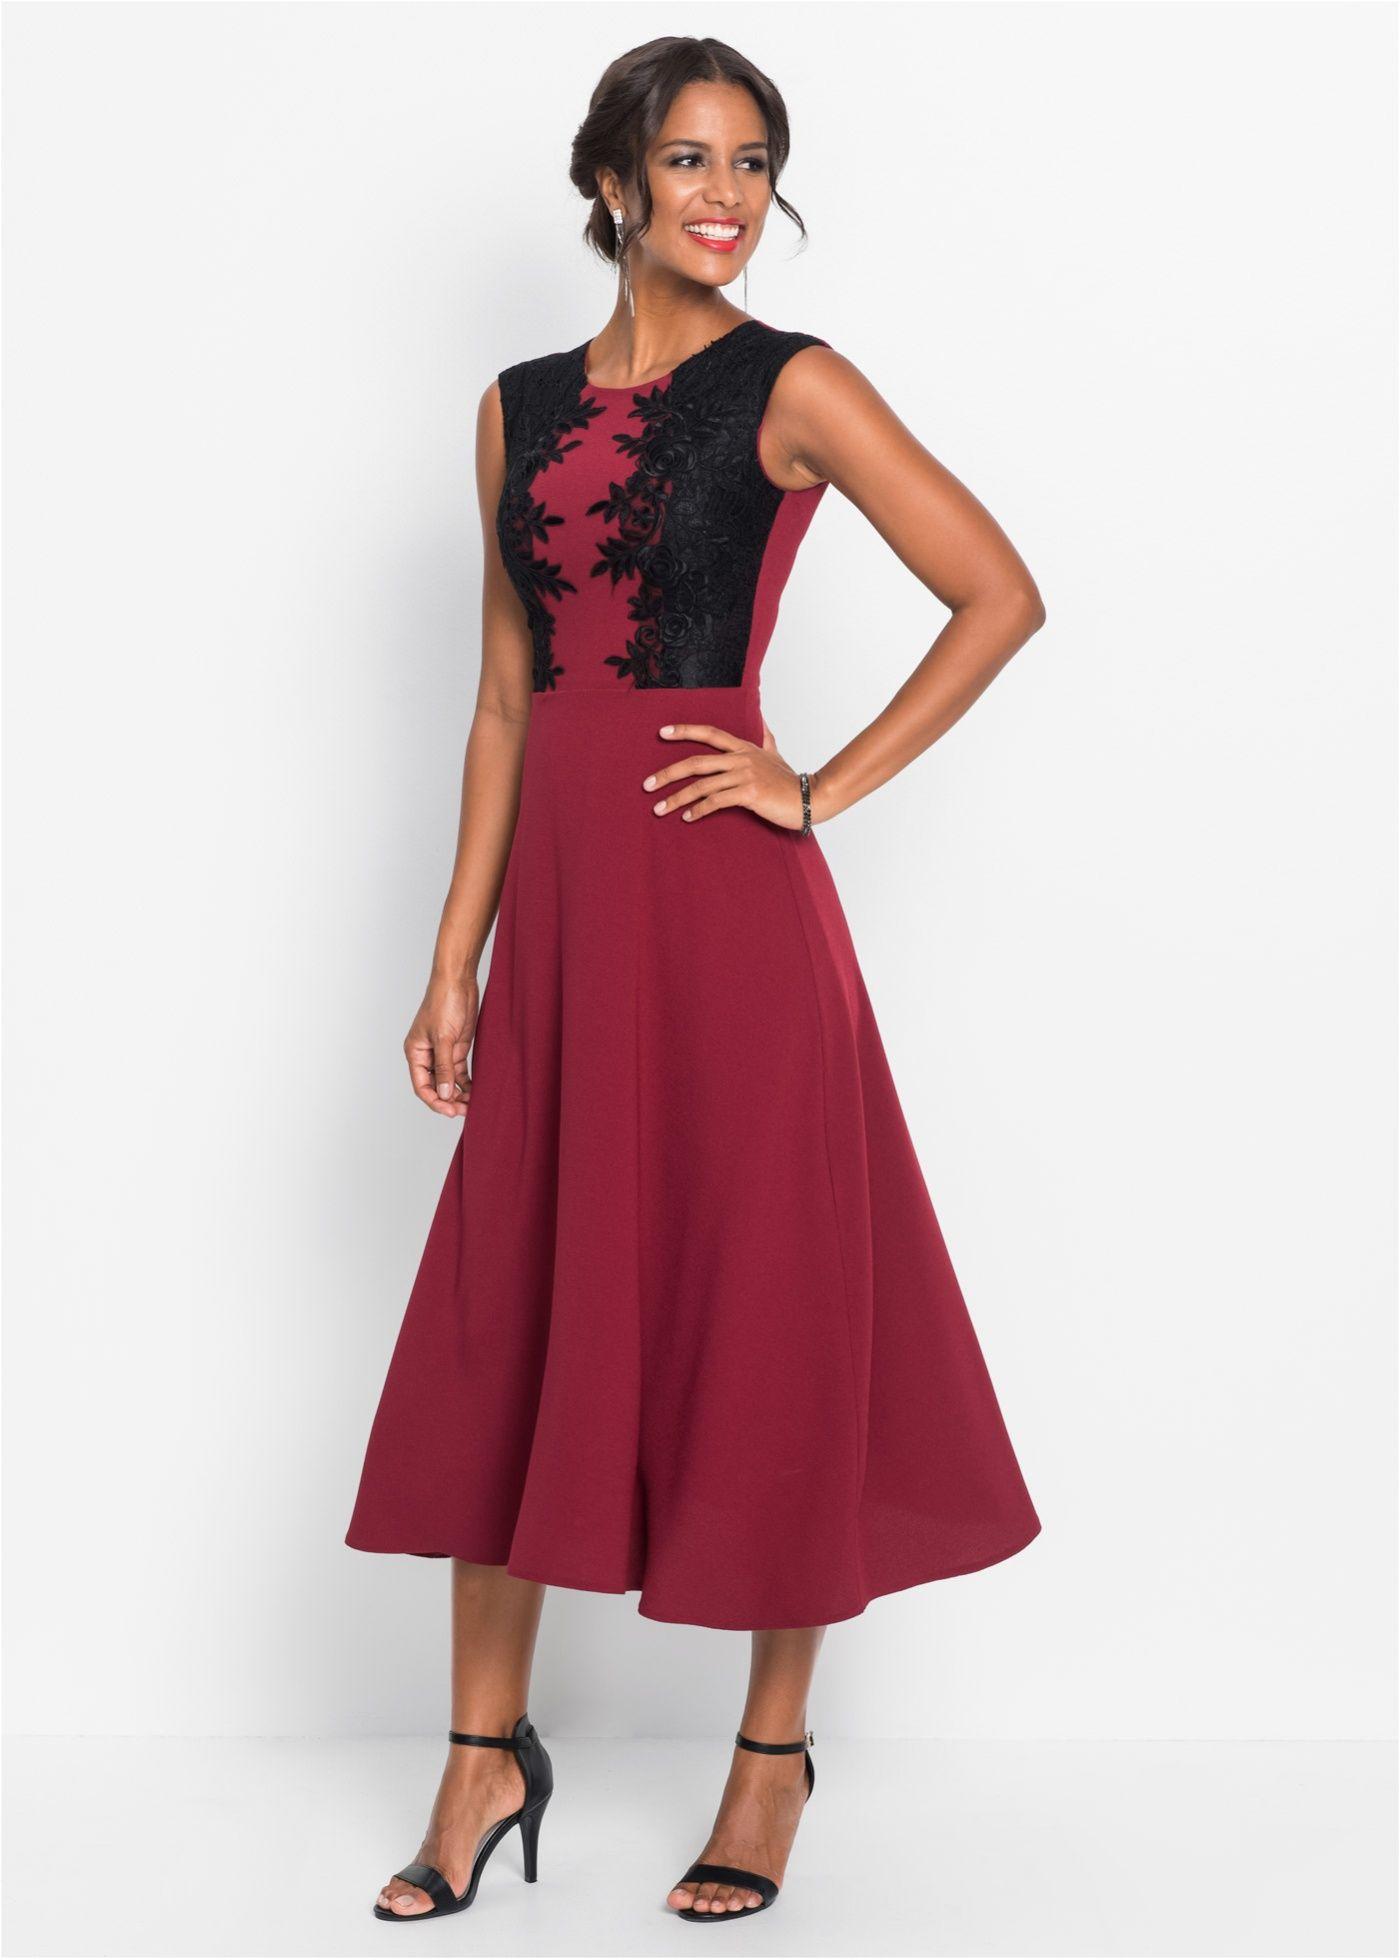 Abendkleid bordeaux/schwarz - Damen - BODYFLIRT boutique - bonprix